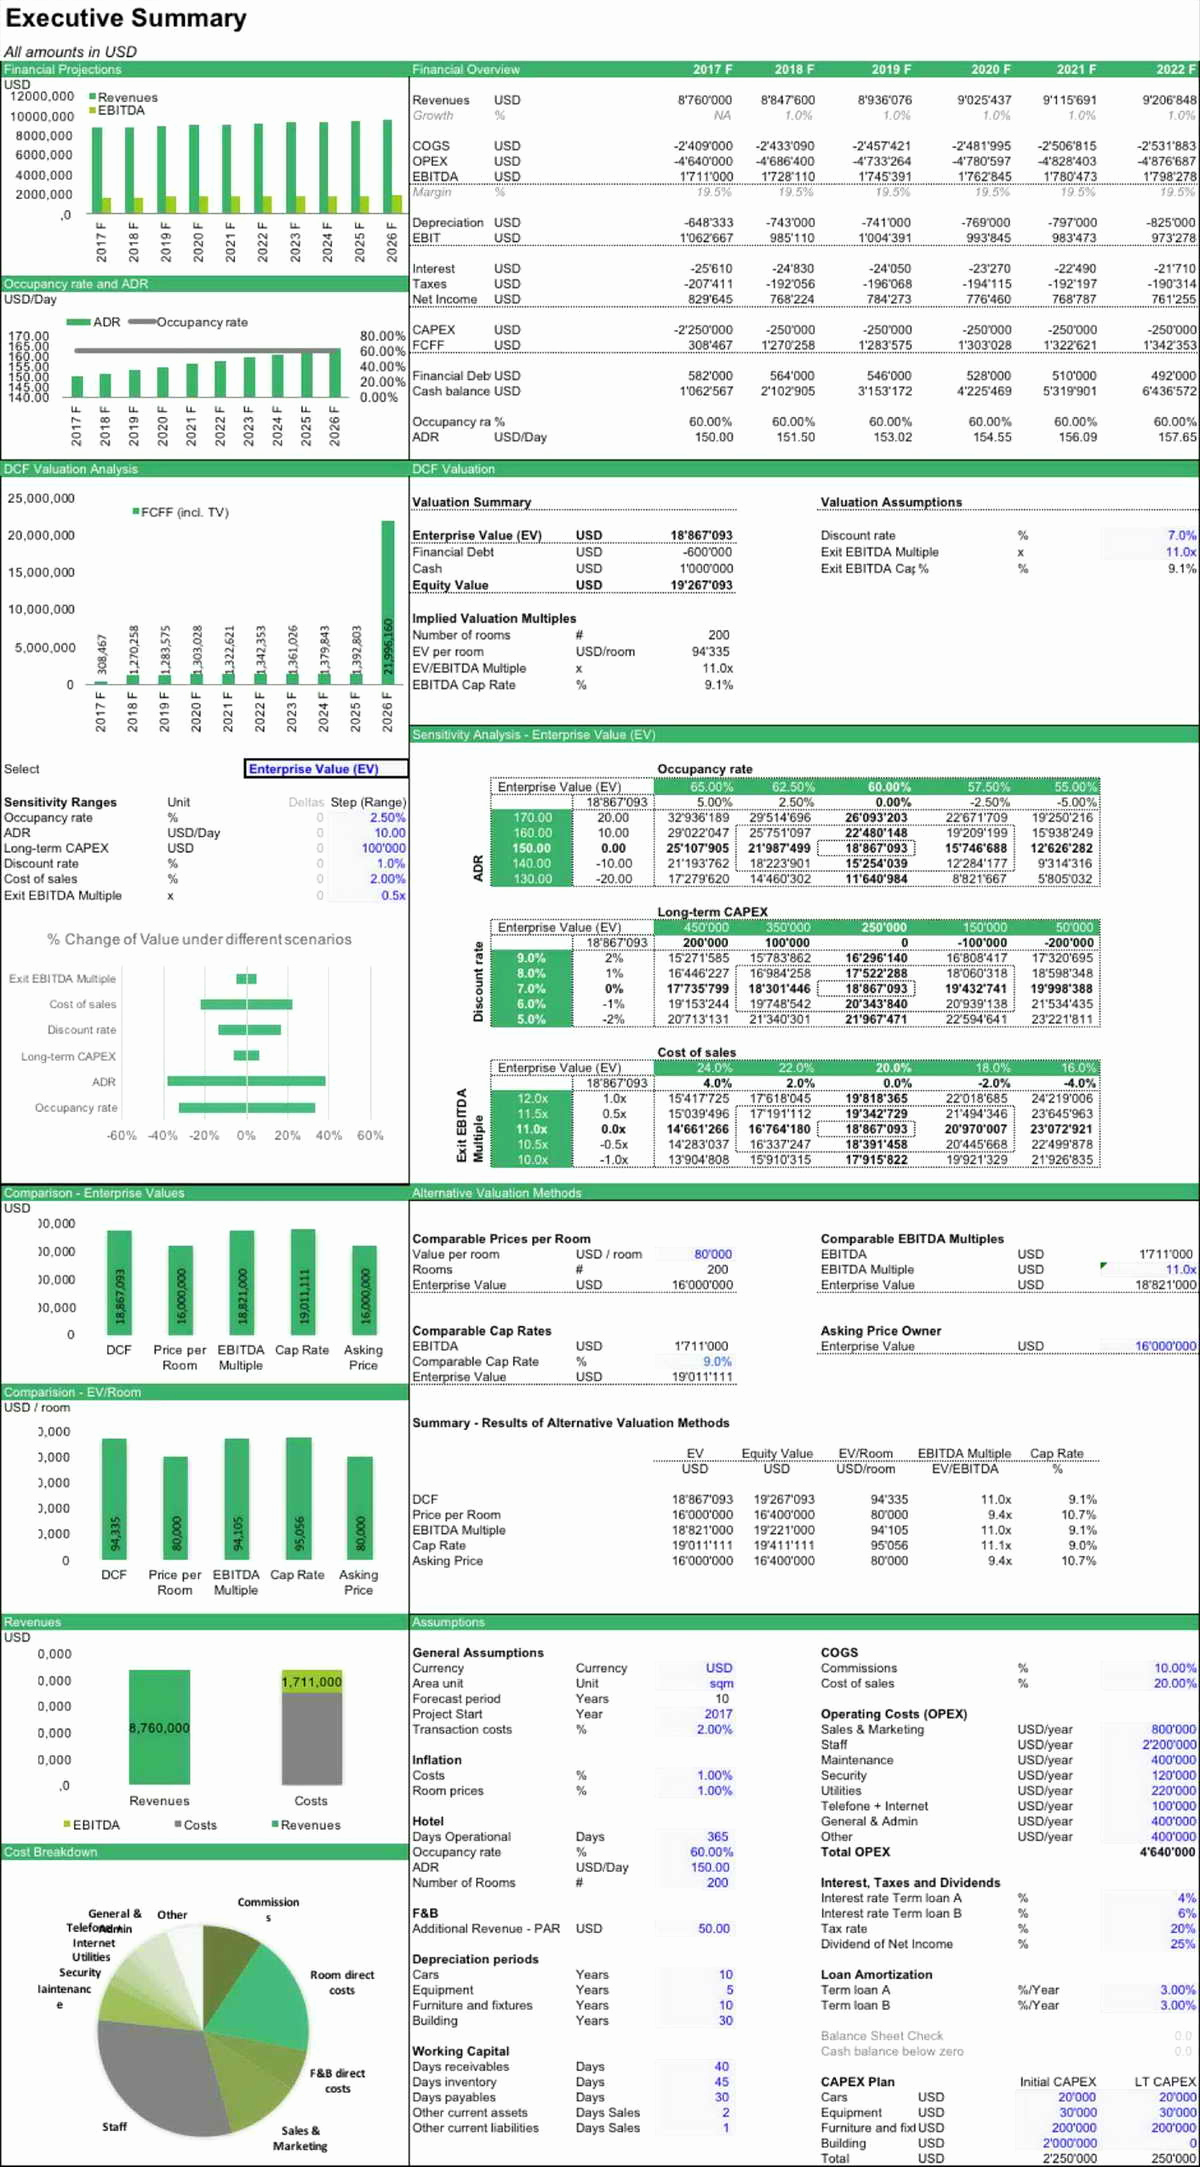 Damodaran Spreadsheet Awesome Business Valuation Spreadsheet With Inside Business Valuation Spreadsheet